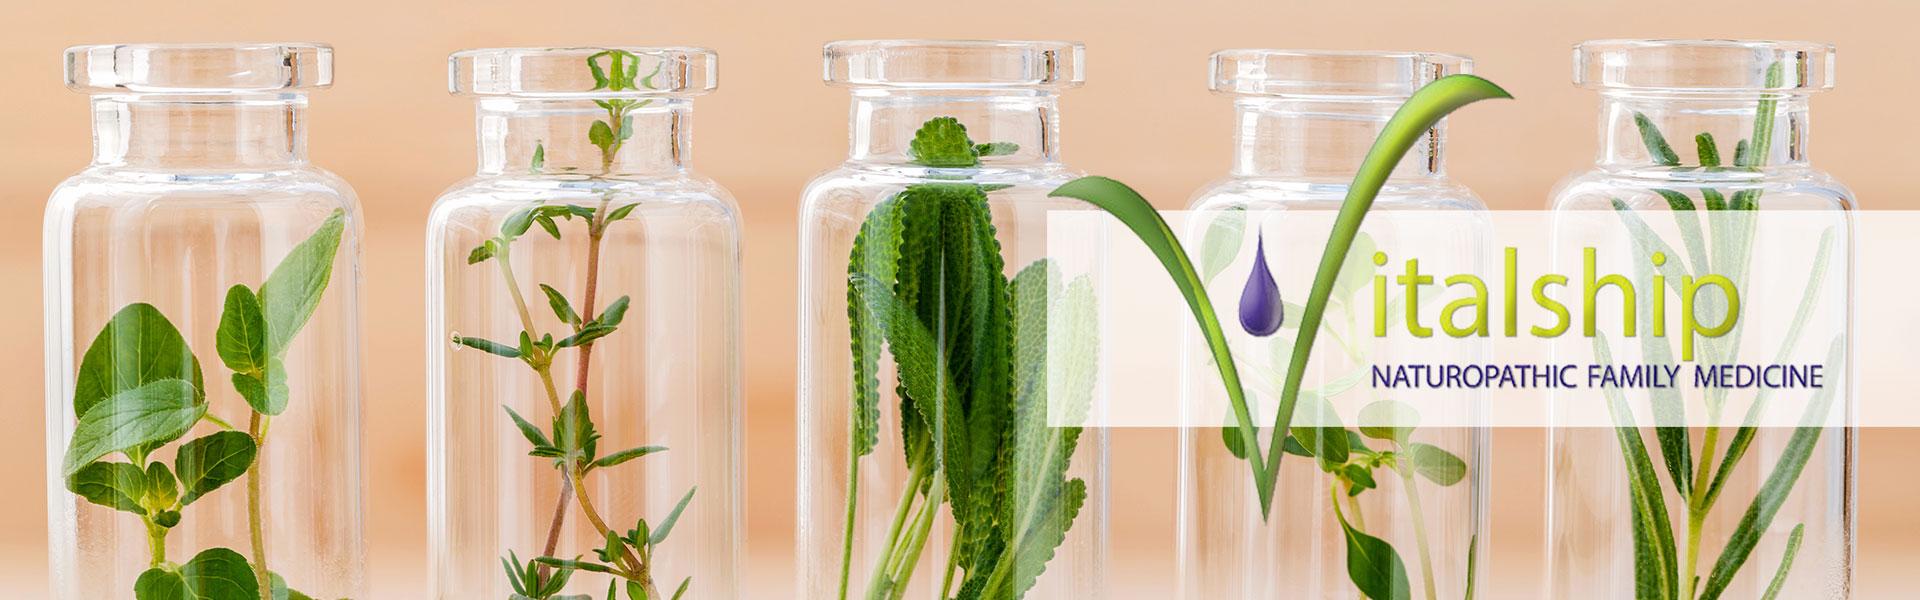 Natural Doctors in Mesa, Arizona | Vitalship Naturopathic Family Medicine